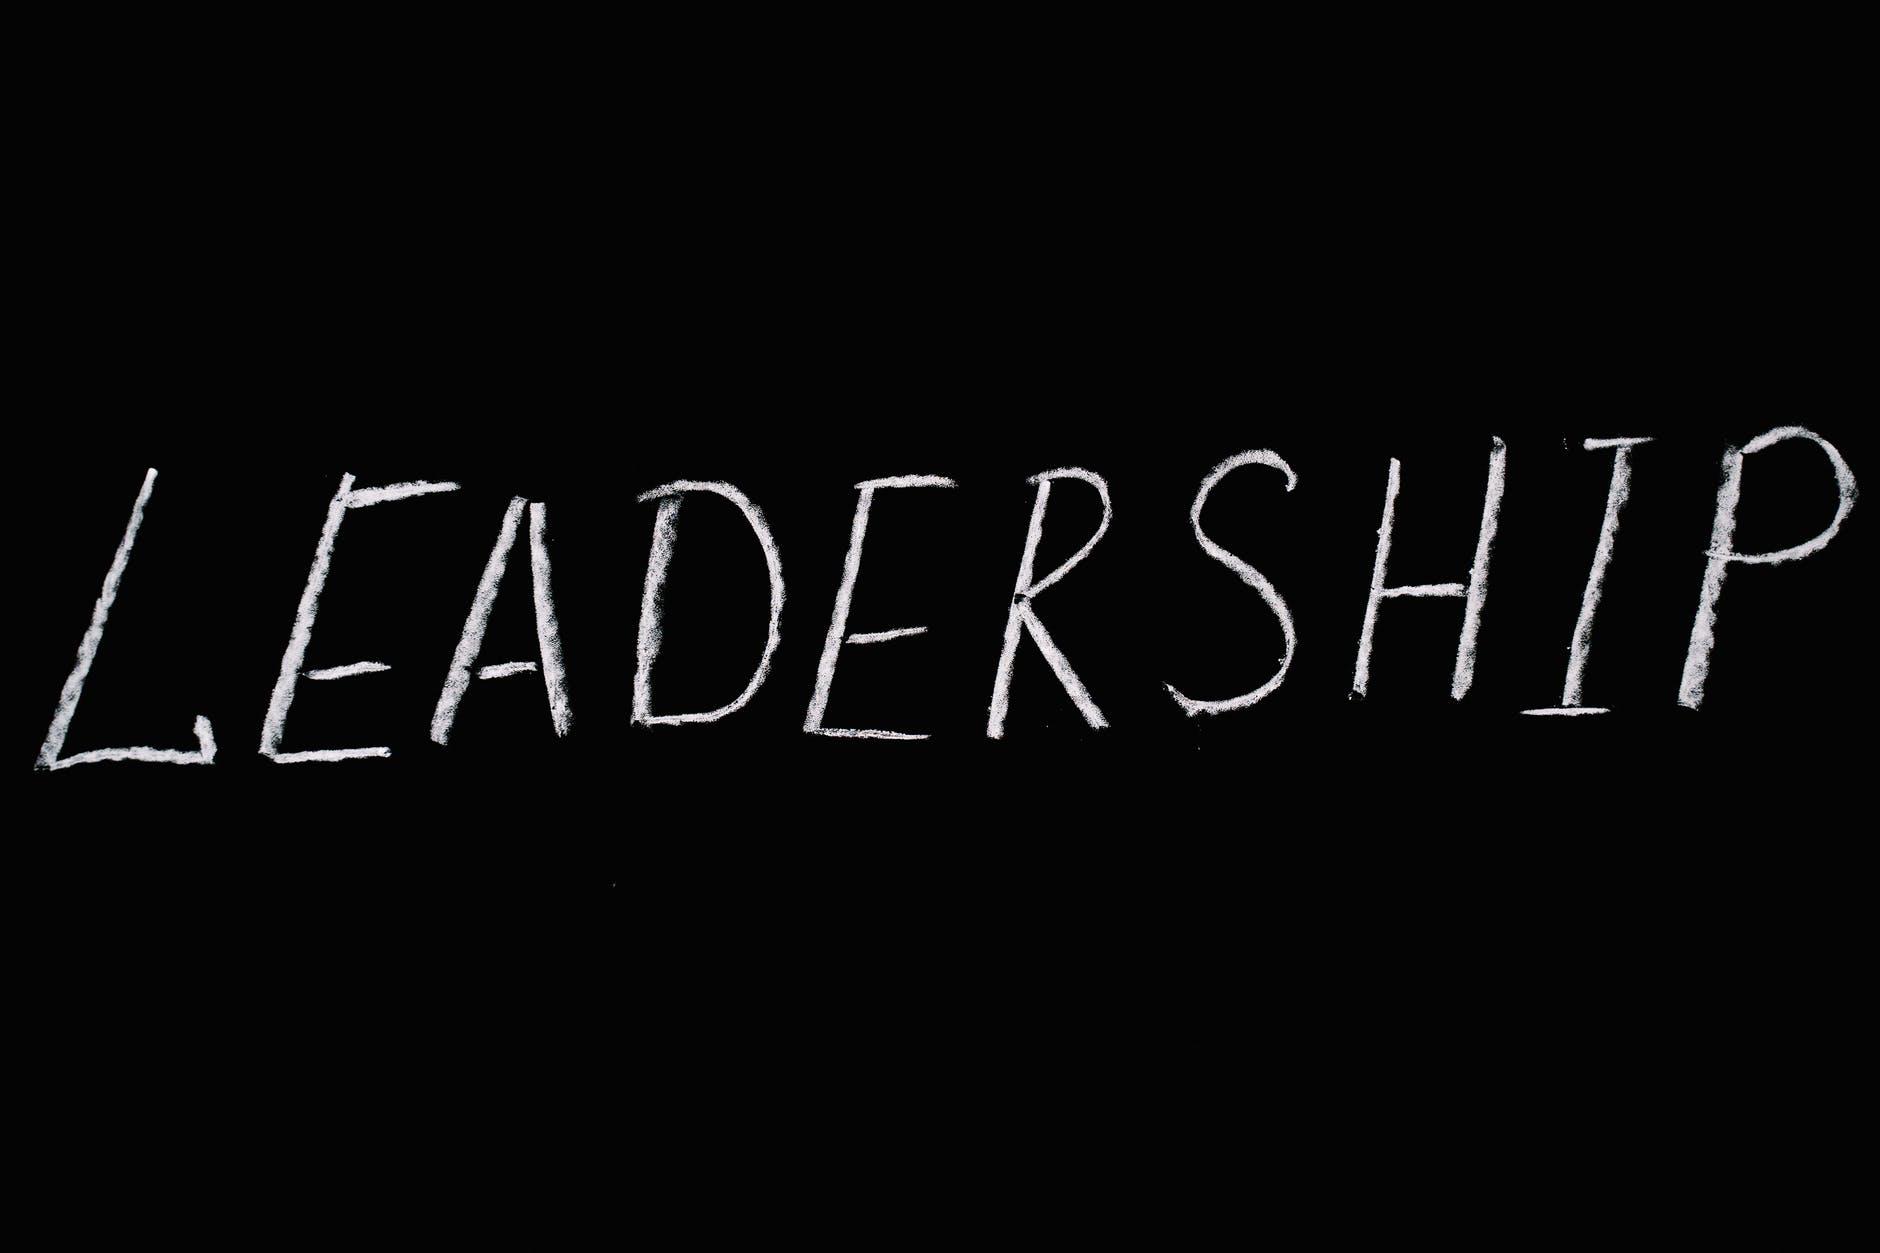 """Leadership"" written in chalk on a black background."